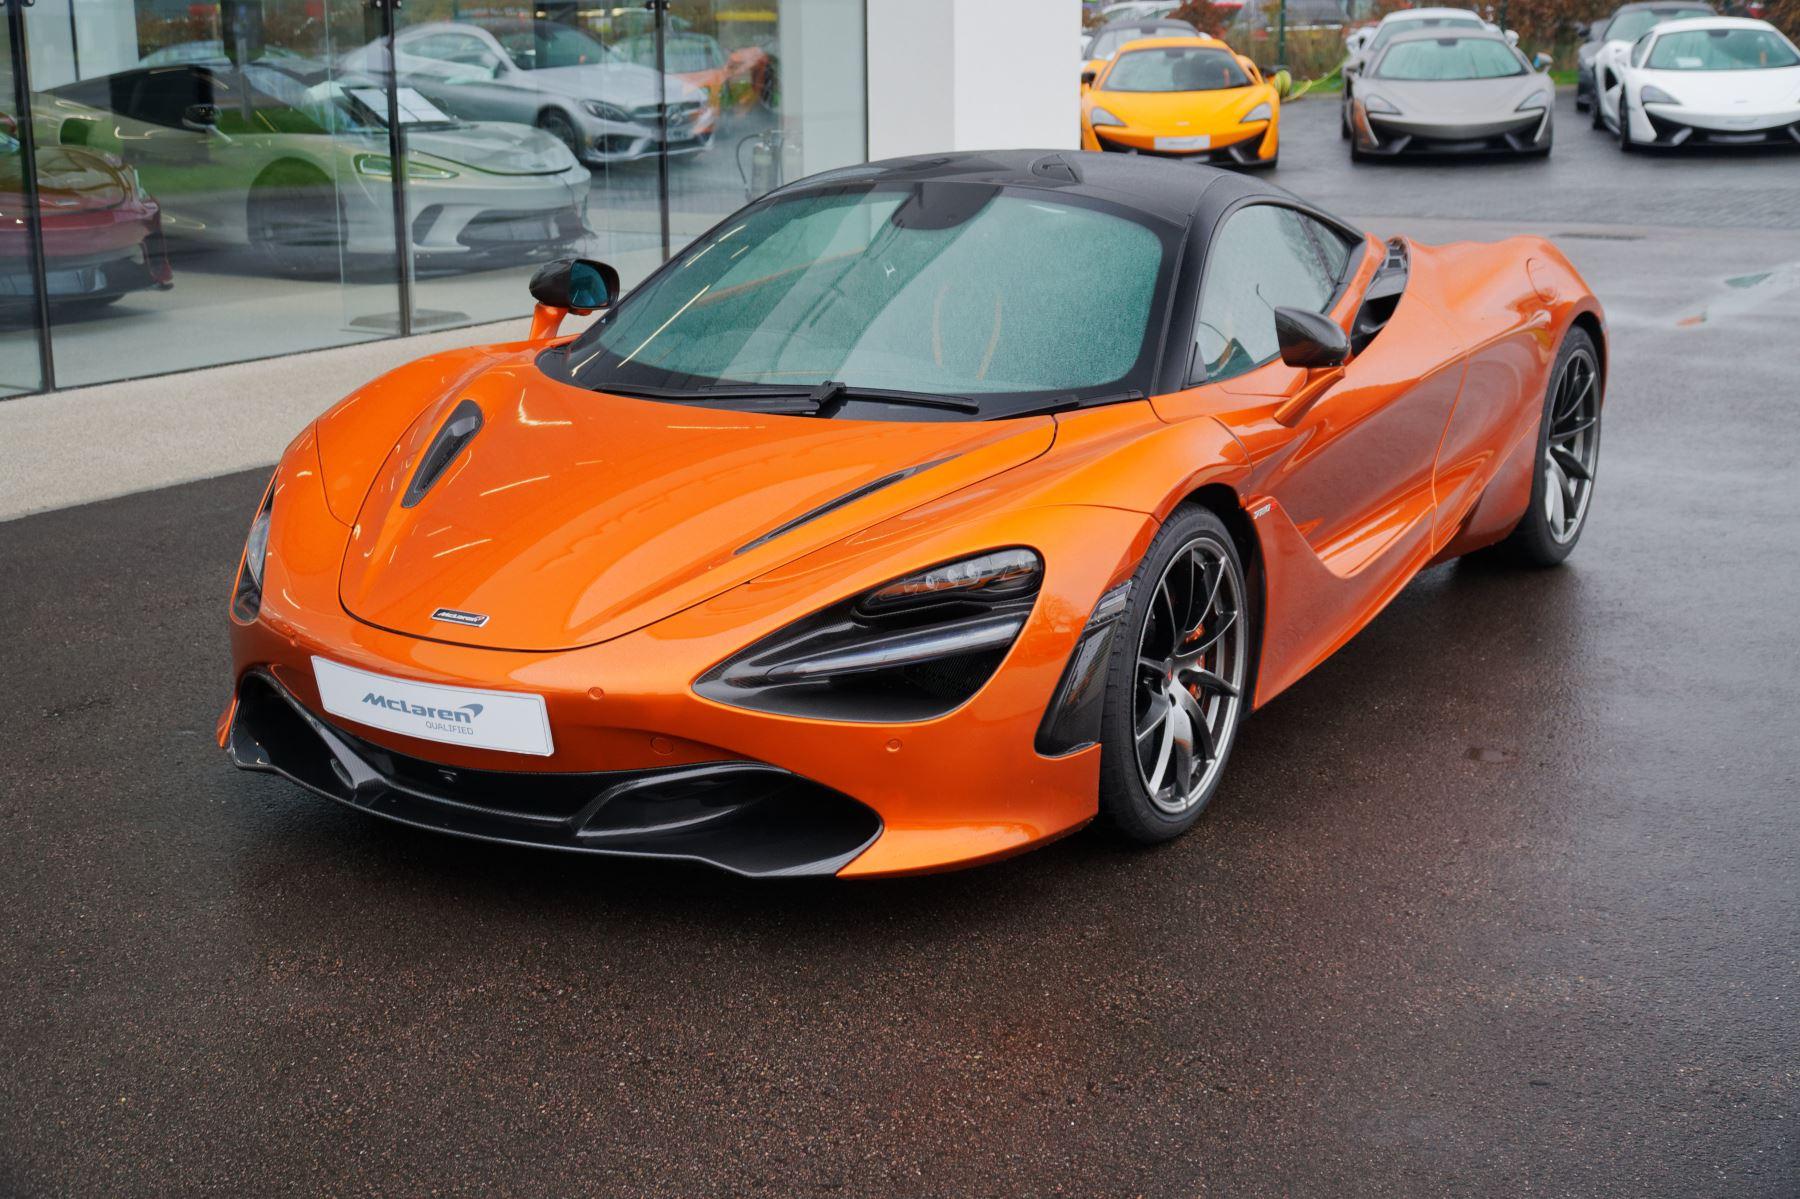 McLaren 720S Performance 4.0 Semi-Automatic 2 door Coupe (2017)